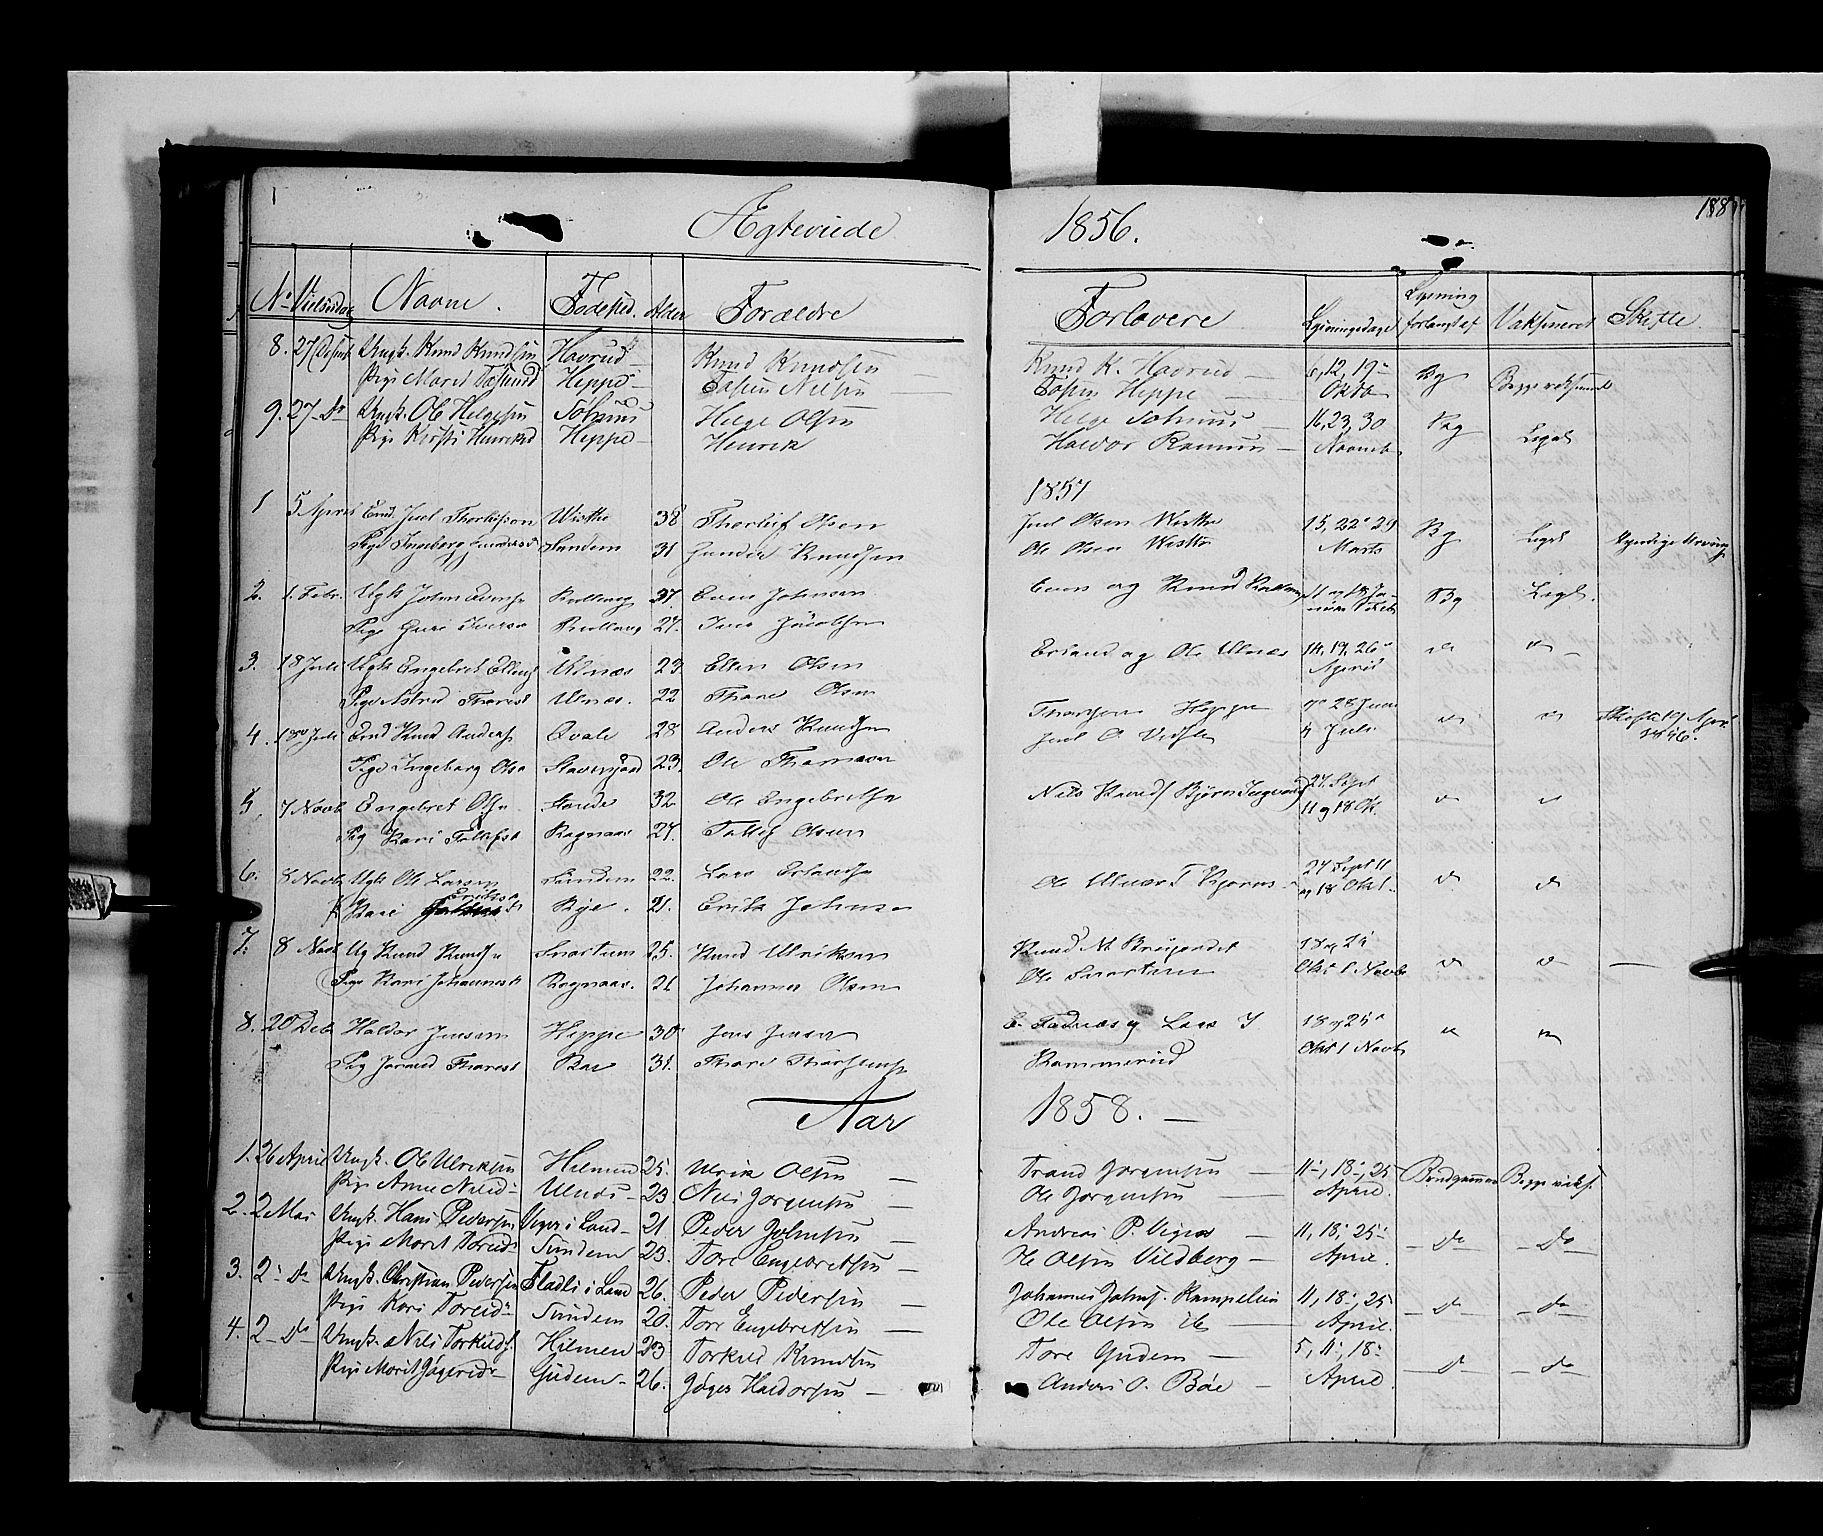 SAH, Nord-Aurdal prestekontor, Ministerialbok nr. 6, 1842-1863, s. 188